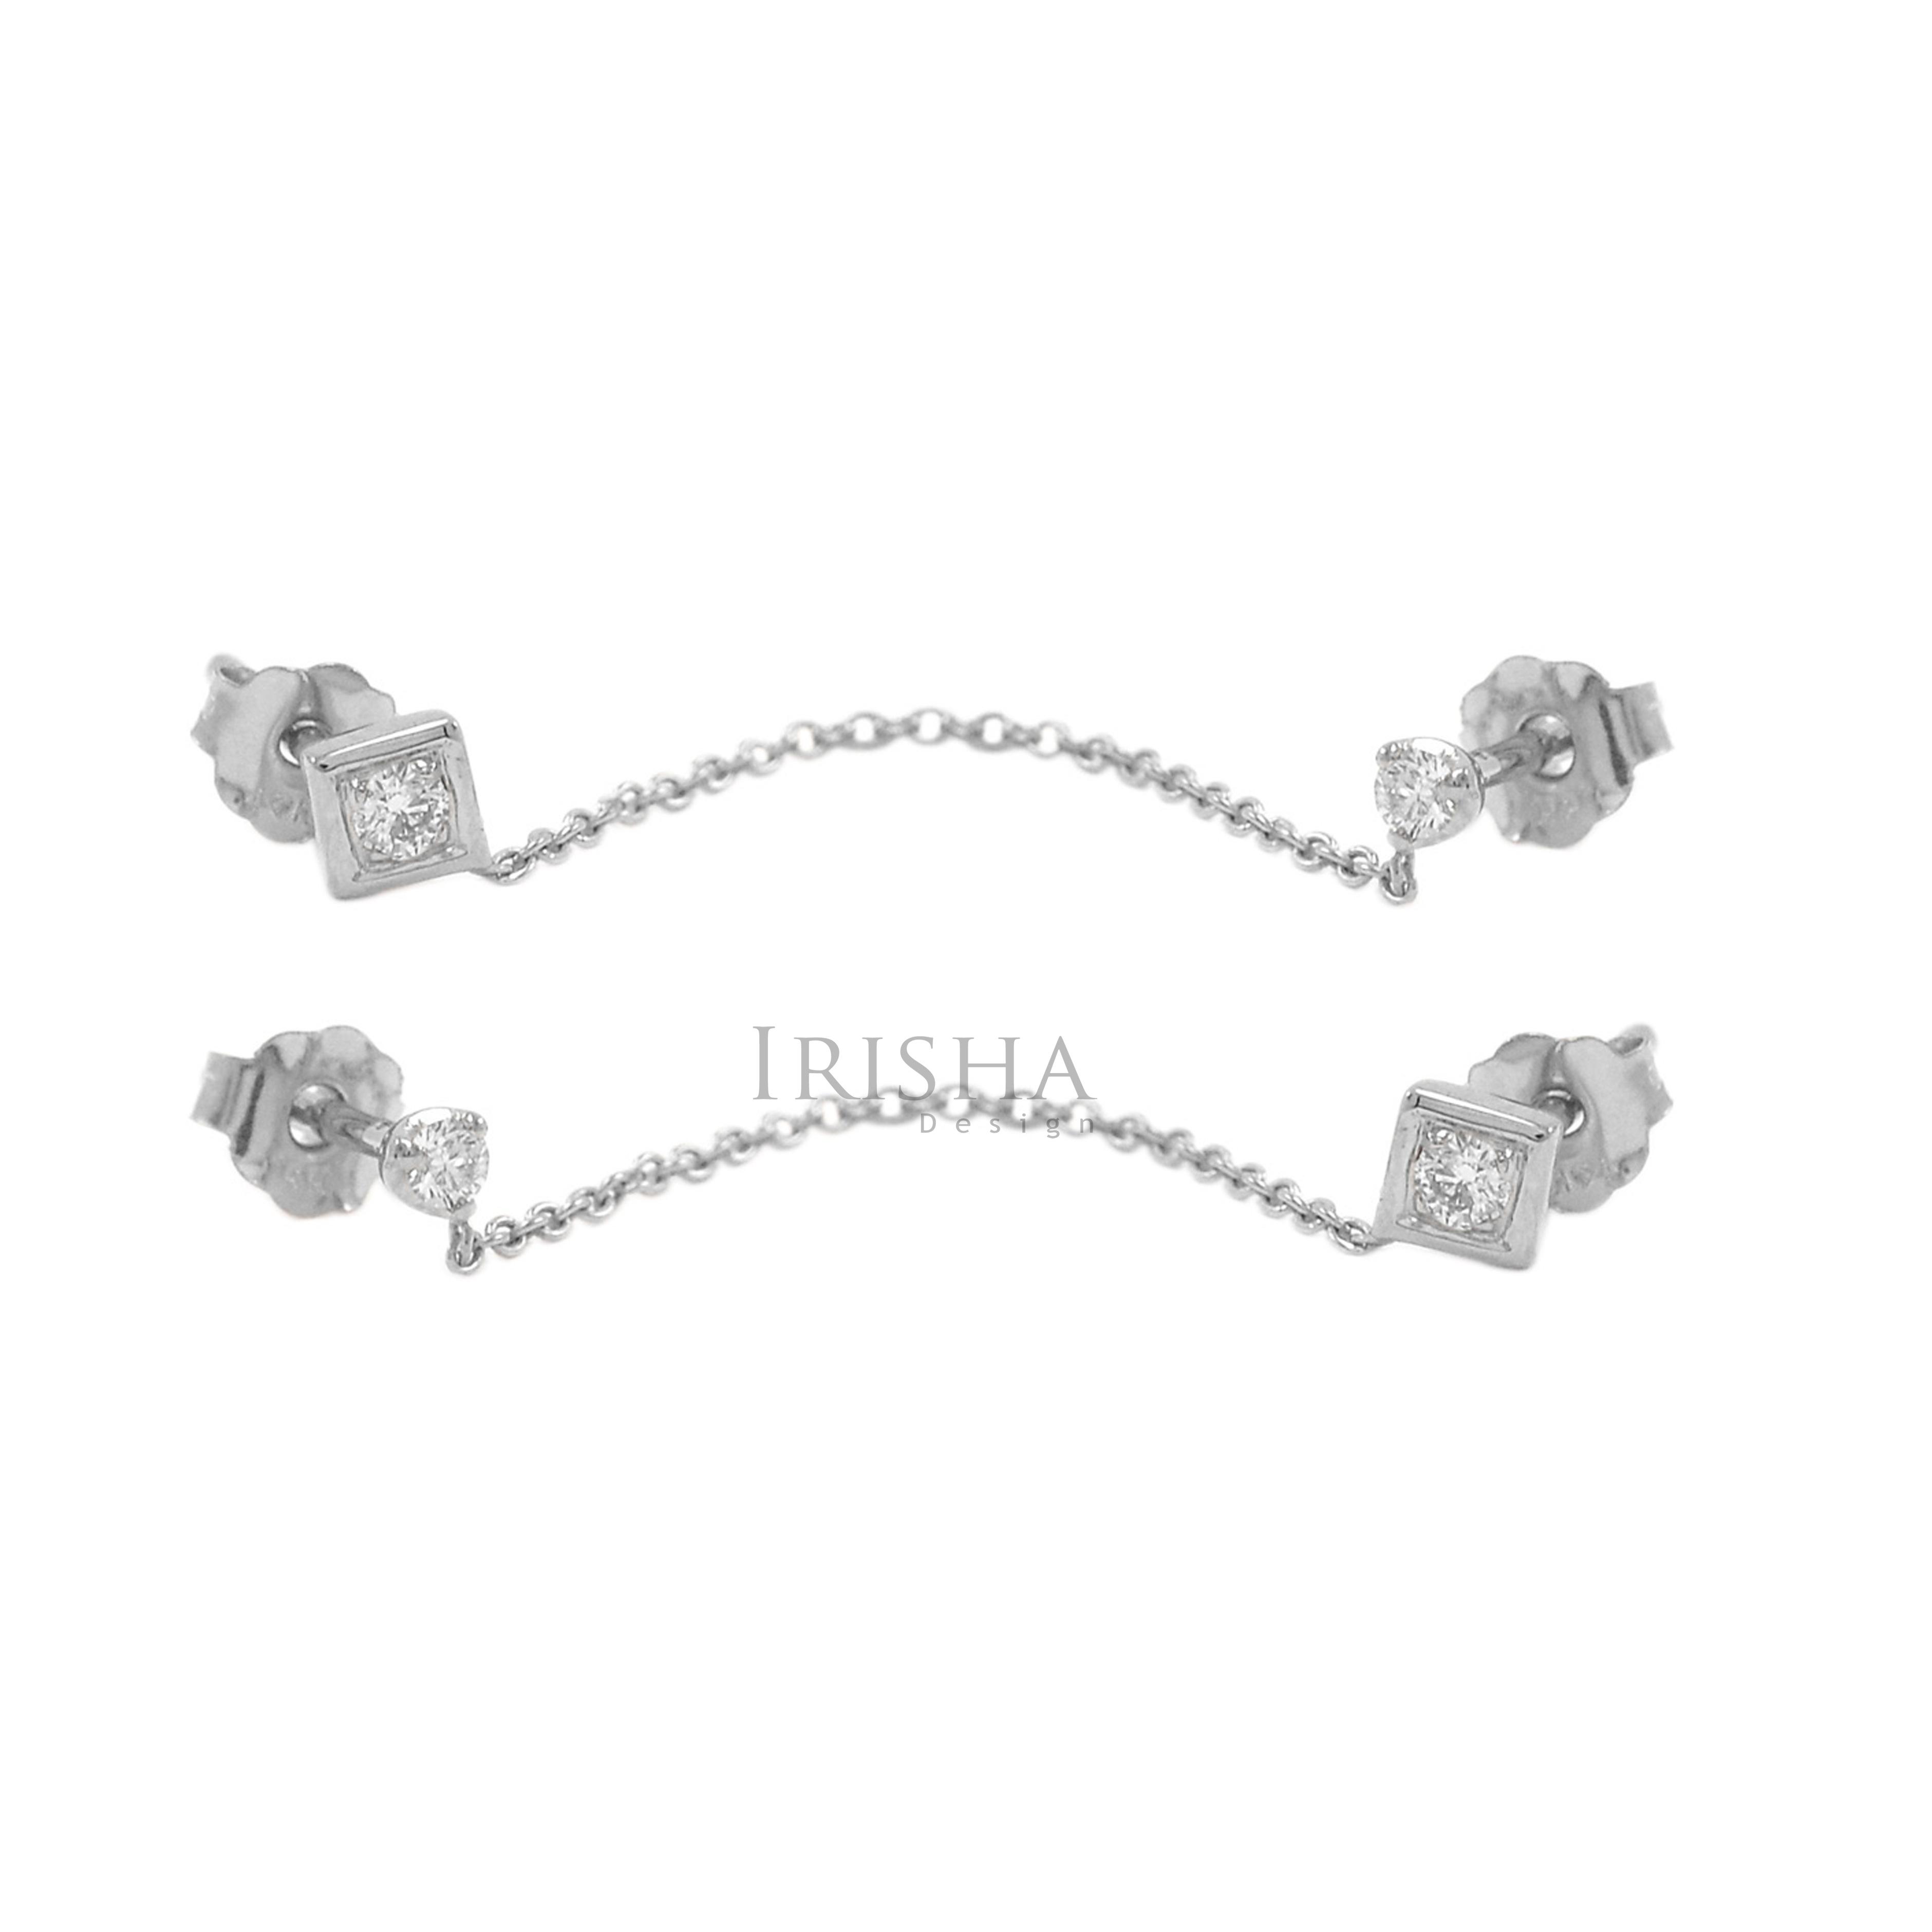 14K Gold 0.14 Ct. Natural Diamond Double Lobe Piercing Chain Earrings Jewelry